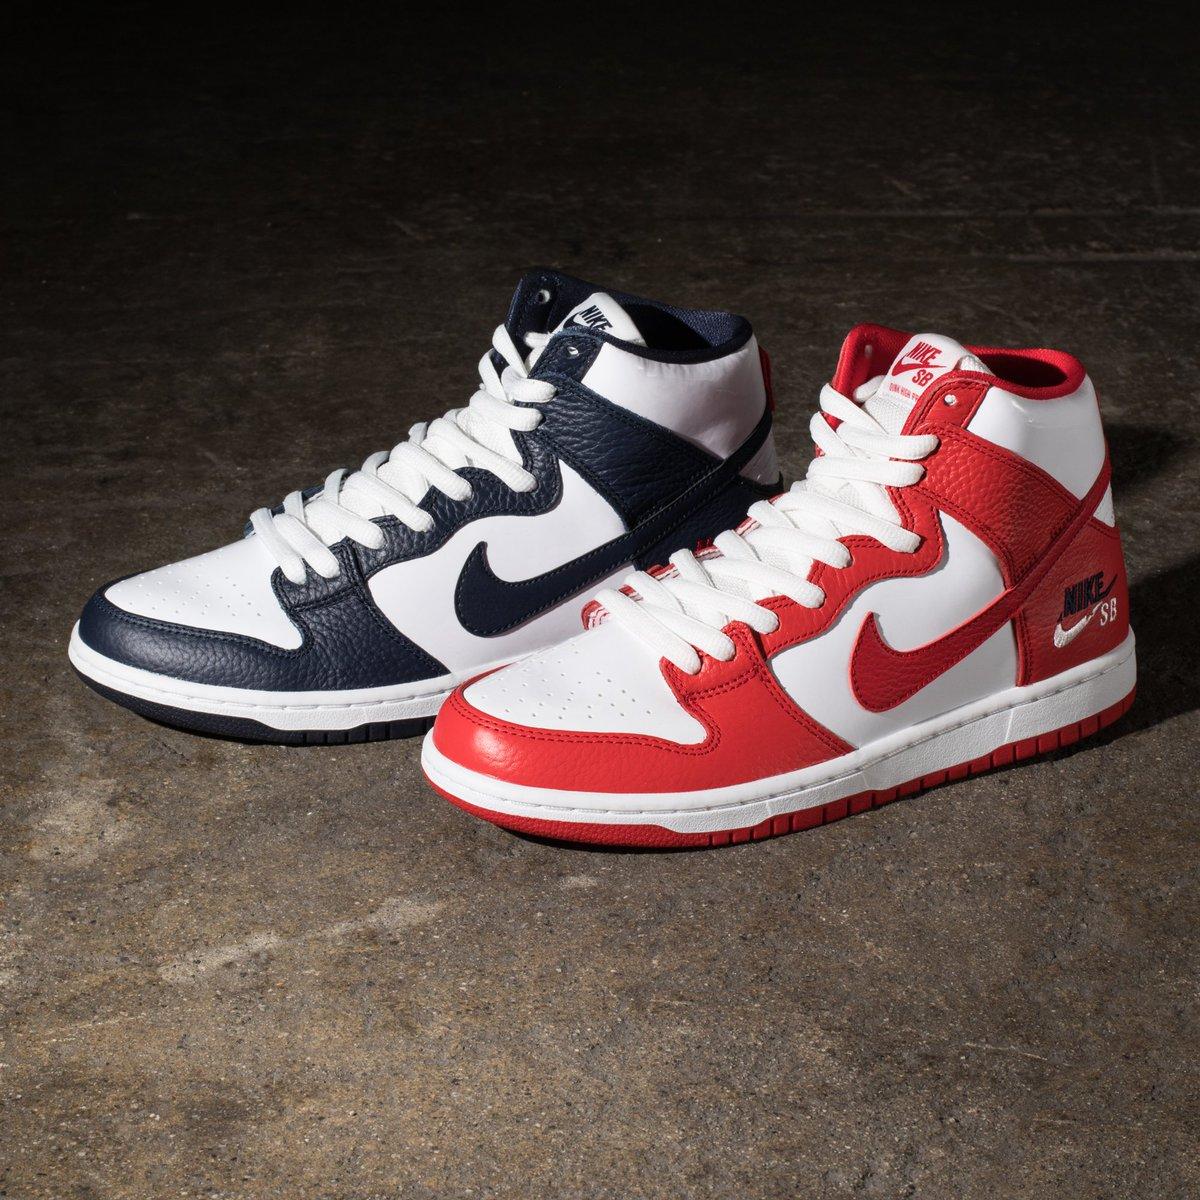 new arrivals 79e09 a890e Nike SB Zoom Dunk High Pro